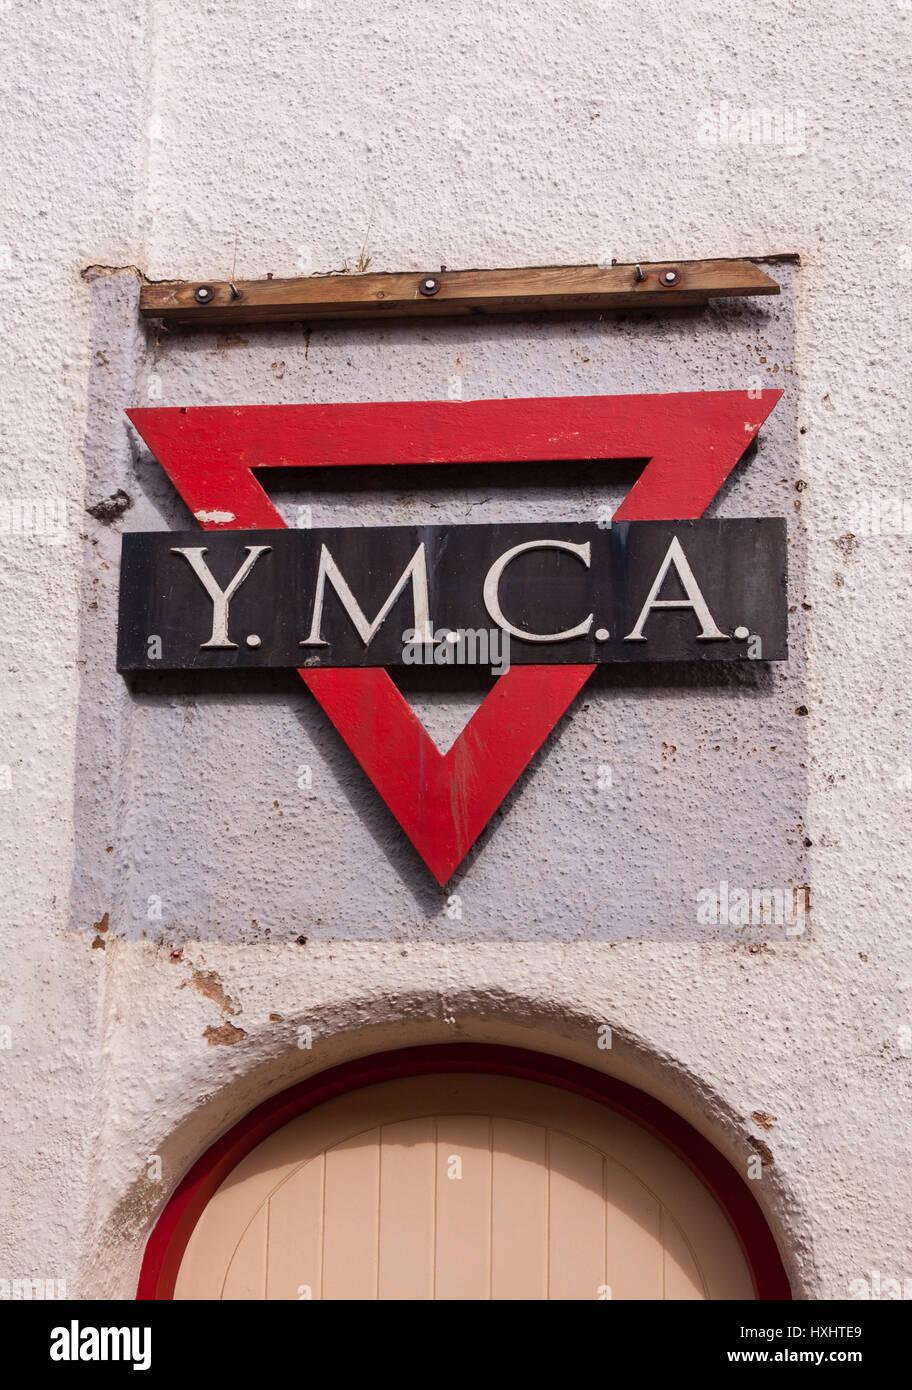 village people ymca free download